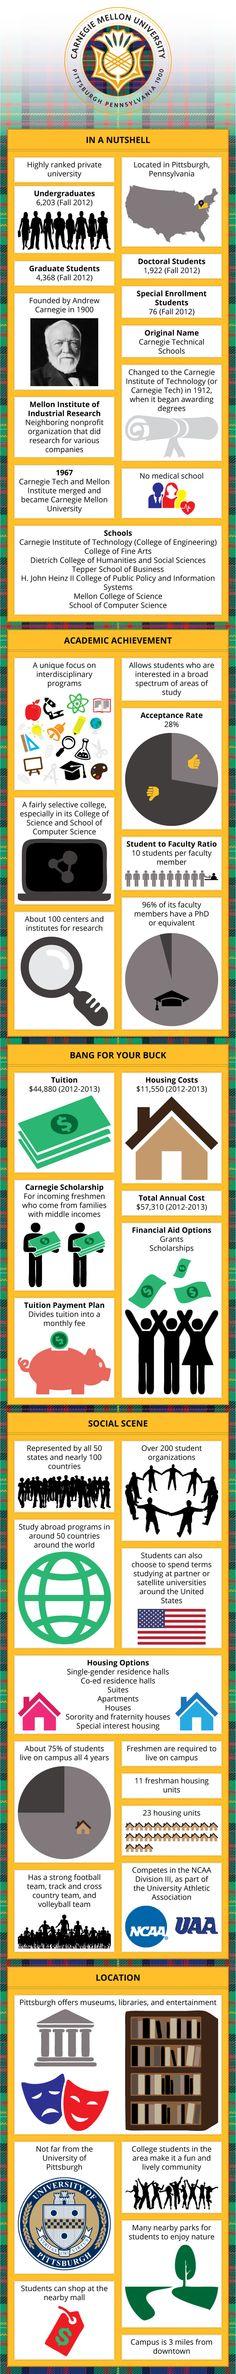 Carnegie Mellon University CMU Infographic I'm thinking for graduate school? World University, University Logo, Career Counseling, Education College, Us Universities, Colleges, Engineering Programs, Continuing Education, Higher Education